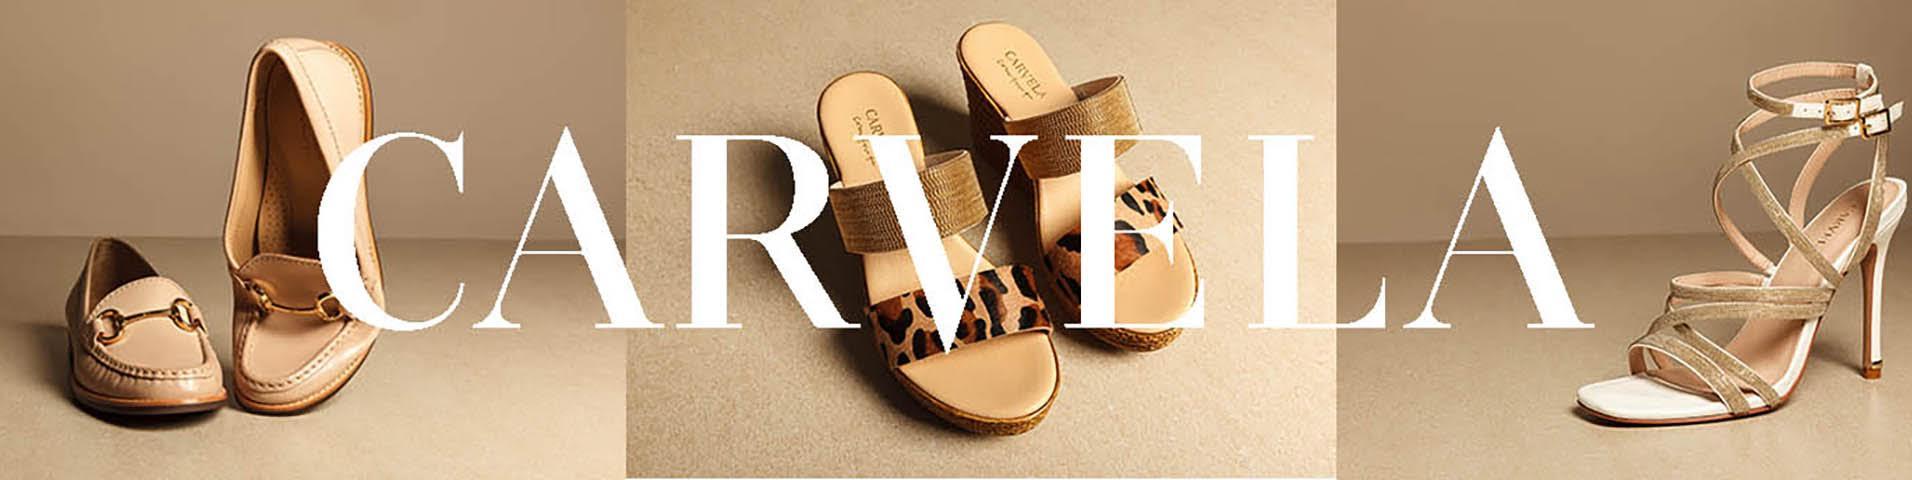 Carvela – Flache, silberne Schnürschuhe aus Leder | Schuhe